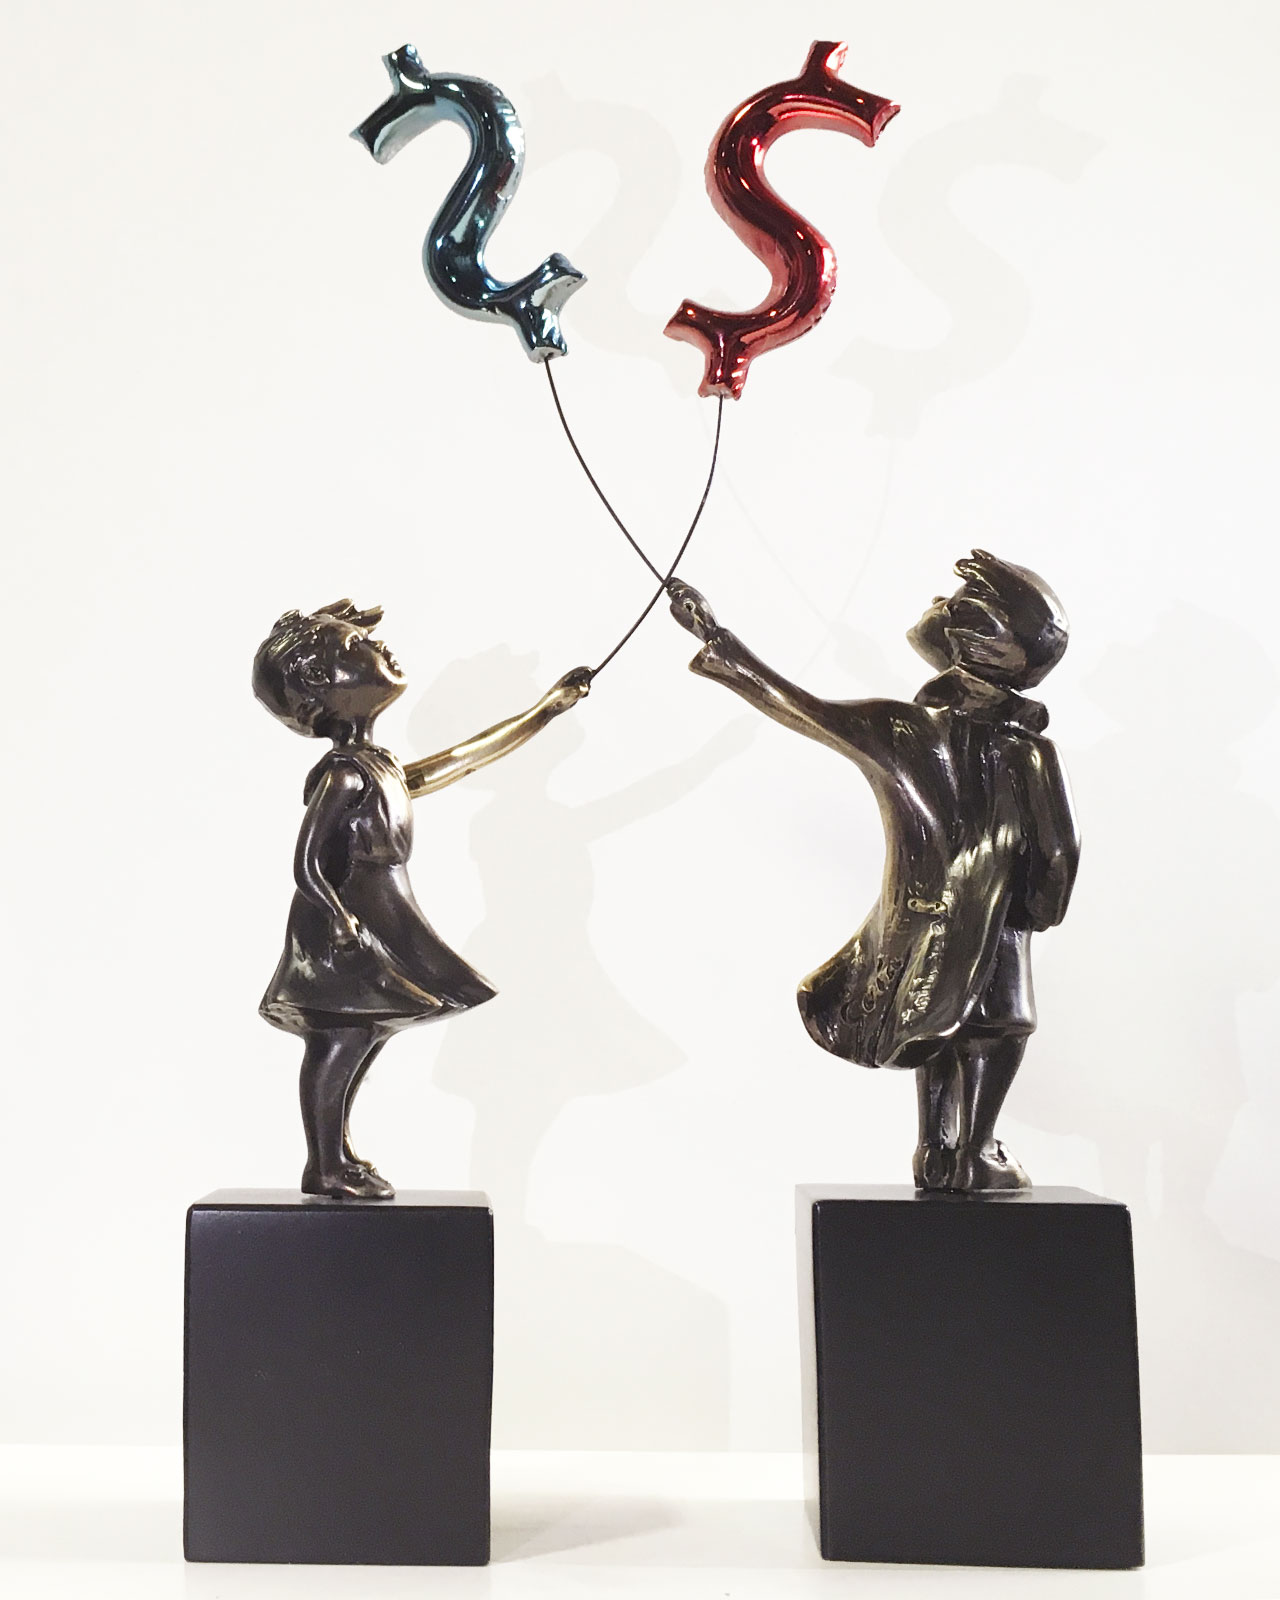 escultura-nina-con-globo-dollar-miguel-guia